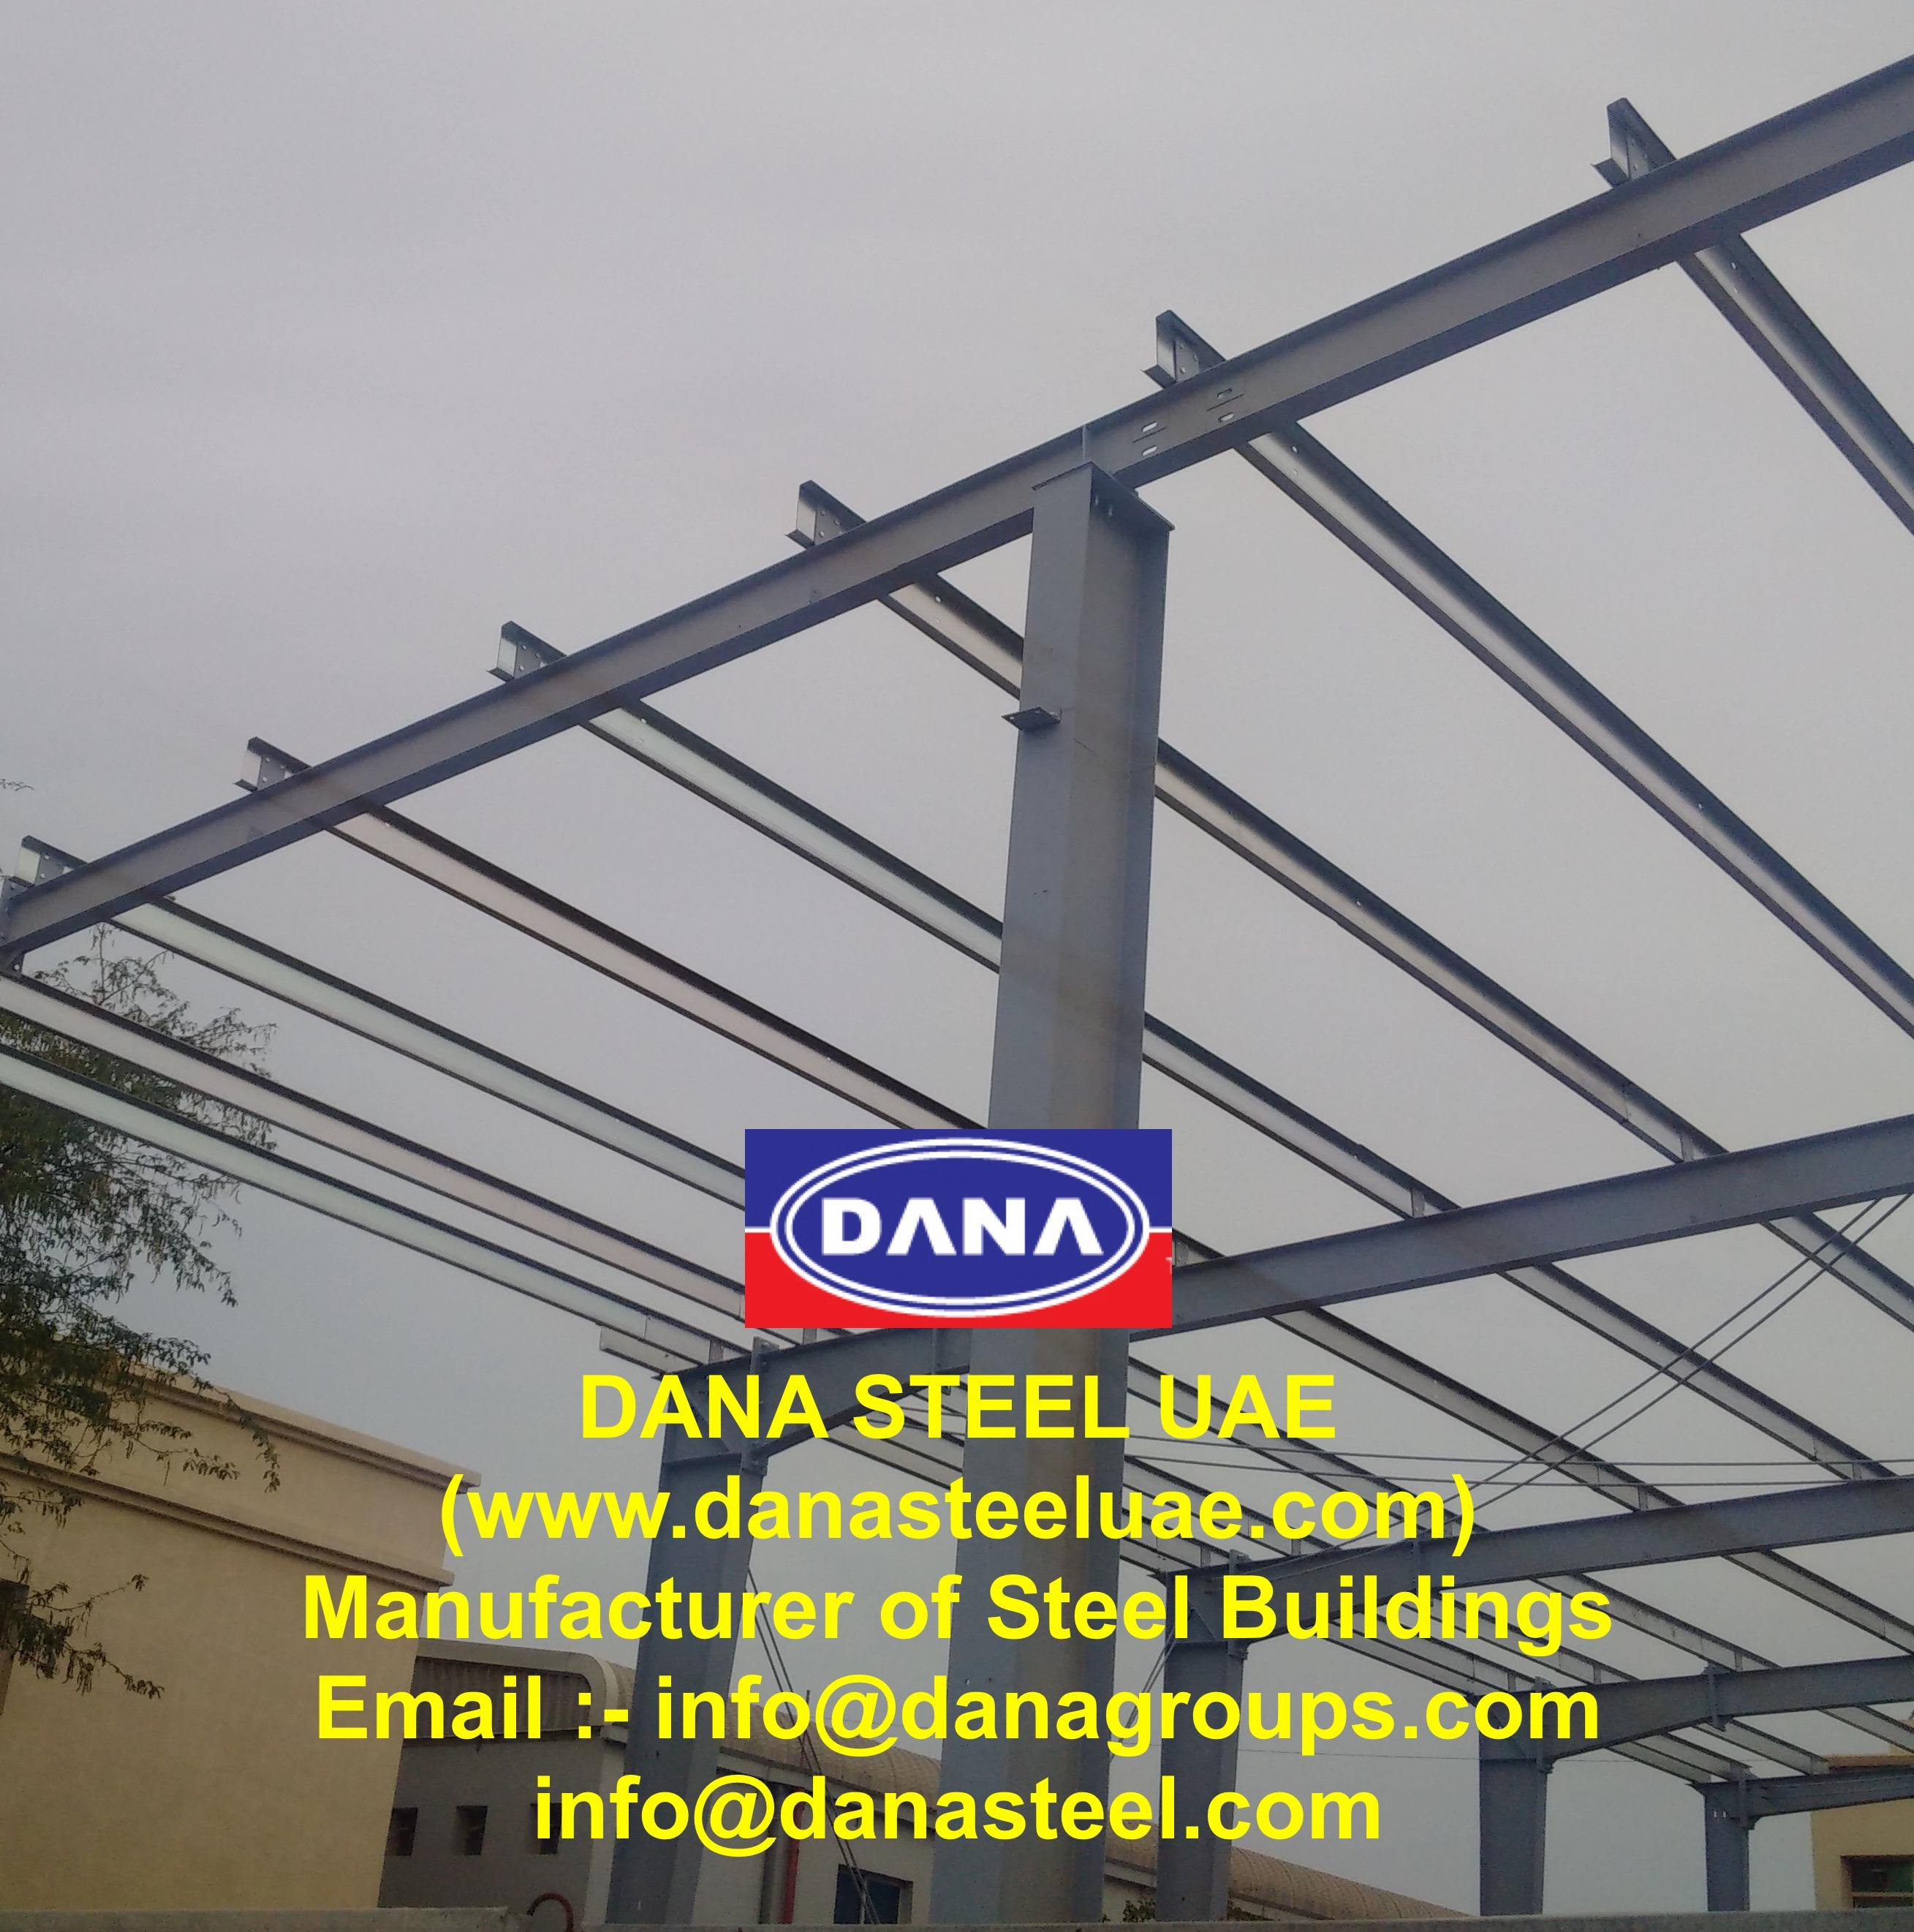 Dana Steel Uae | Dana Group:-A well established group of companies